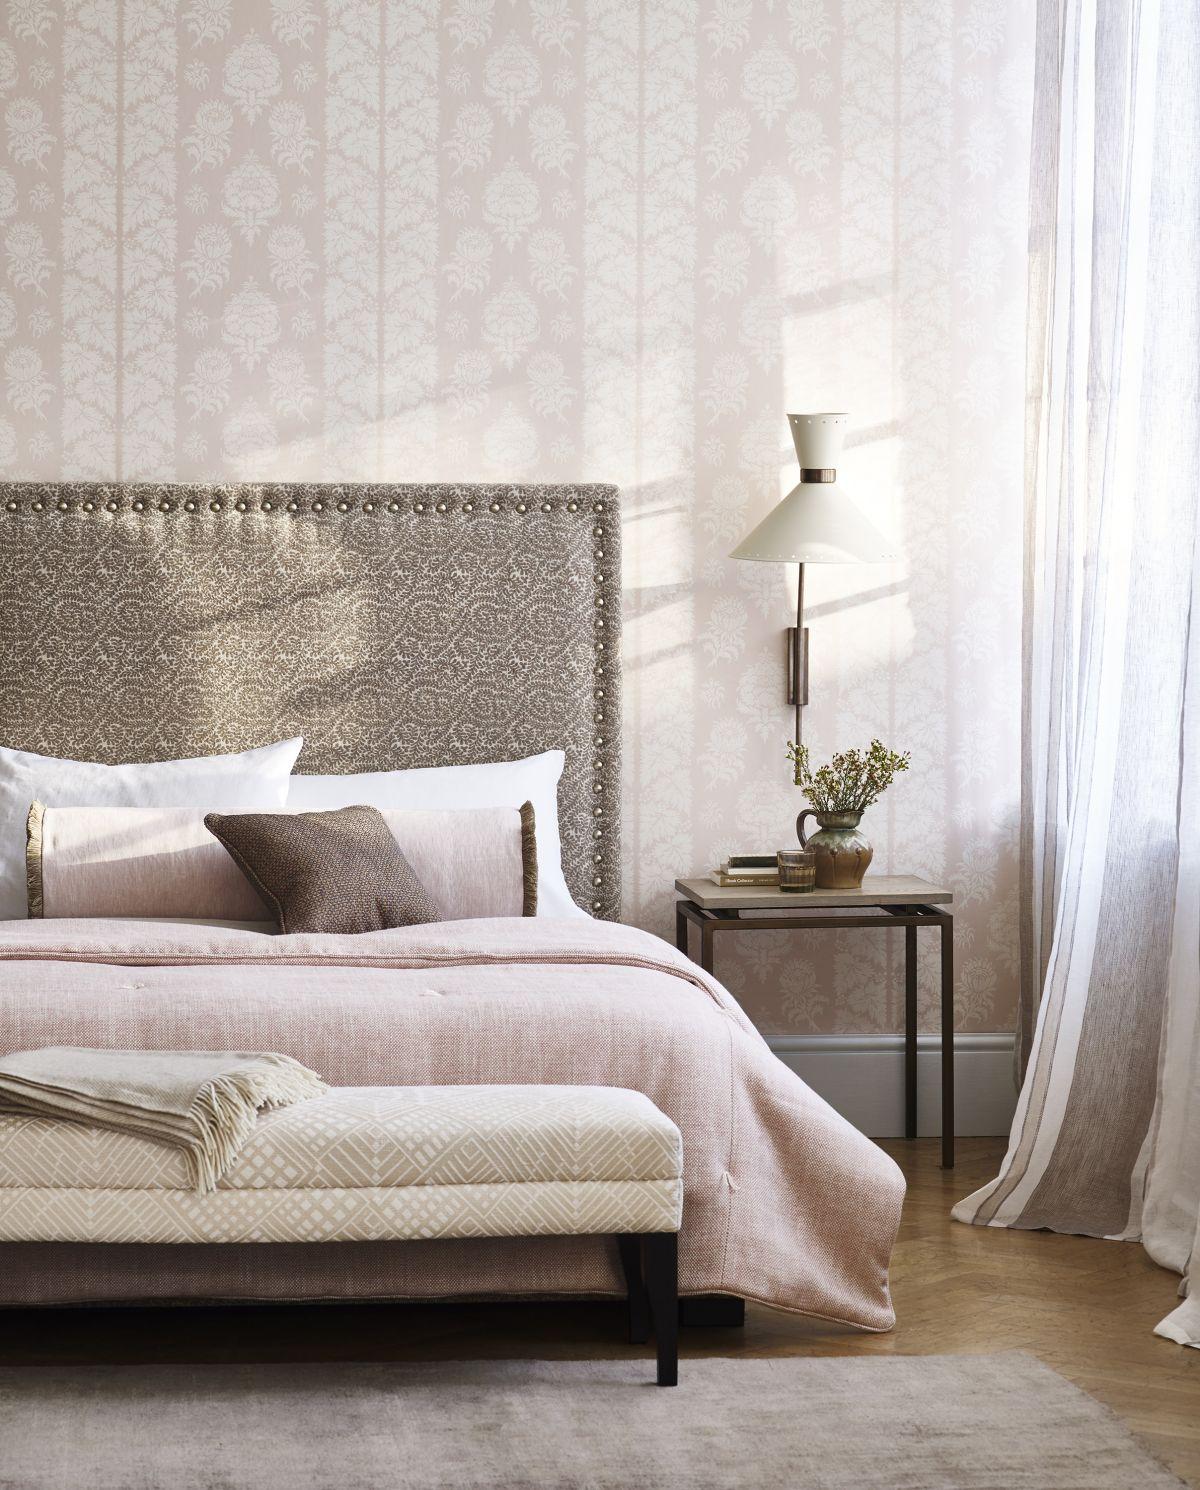 Bedroom curtain ideas: 16 curtain designs for beautiful ... on Bedroom Curtain Ideas  id=15115